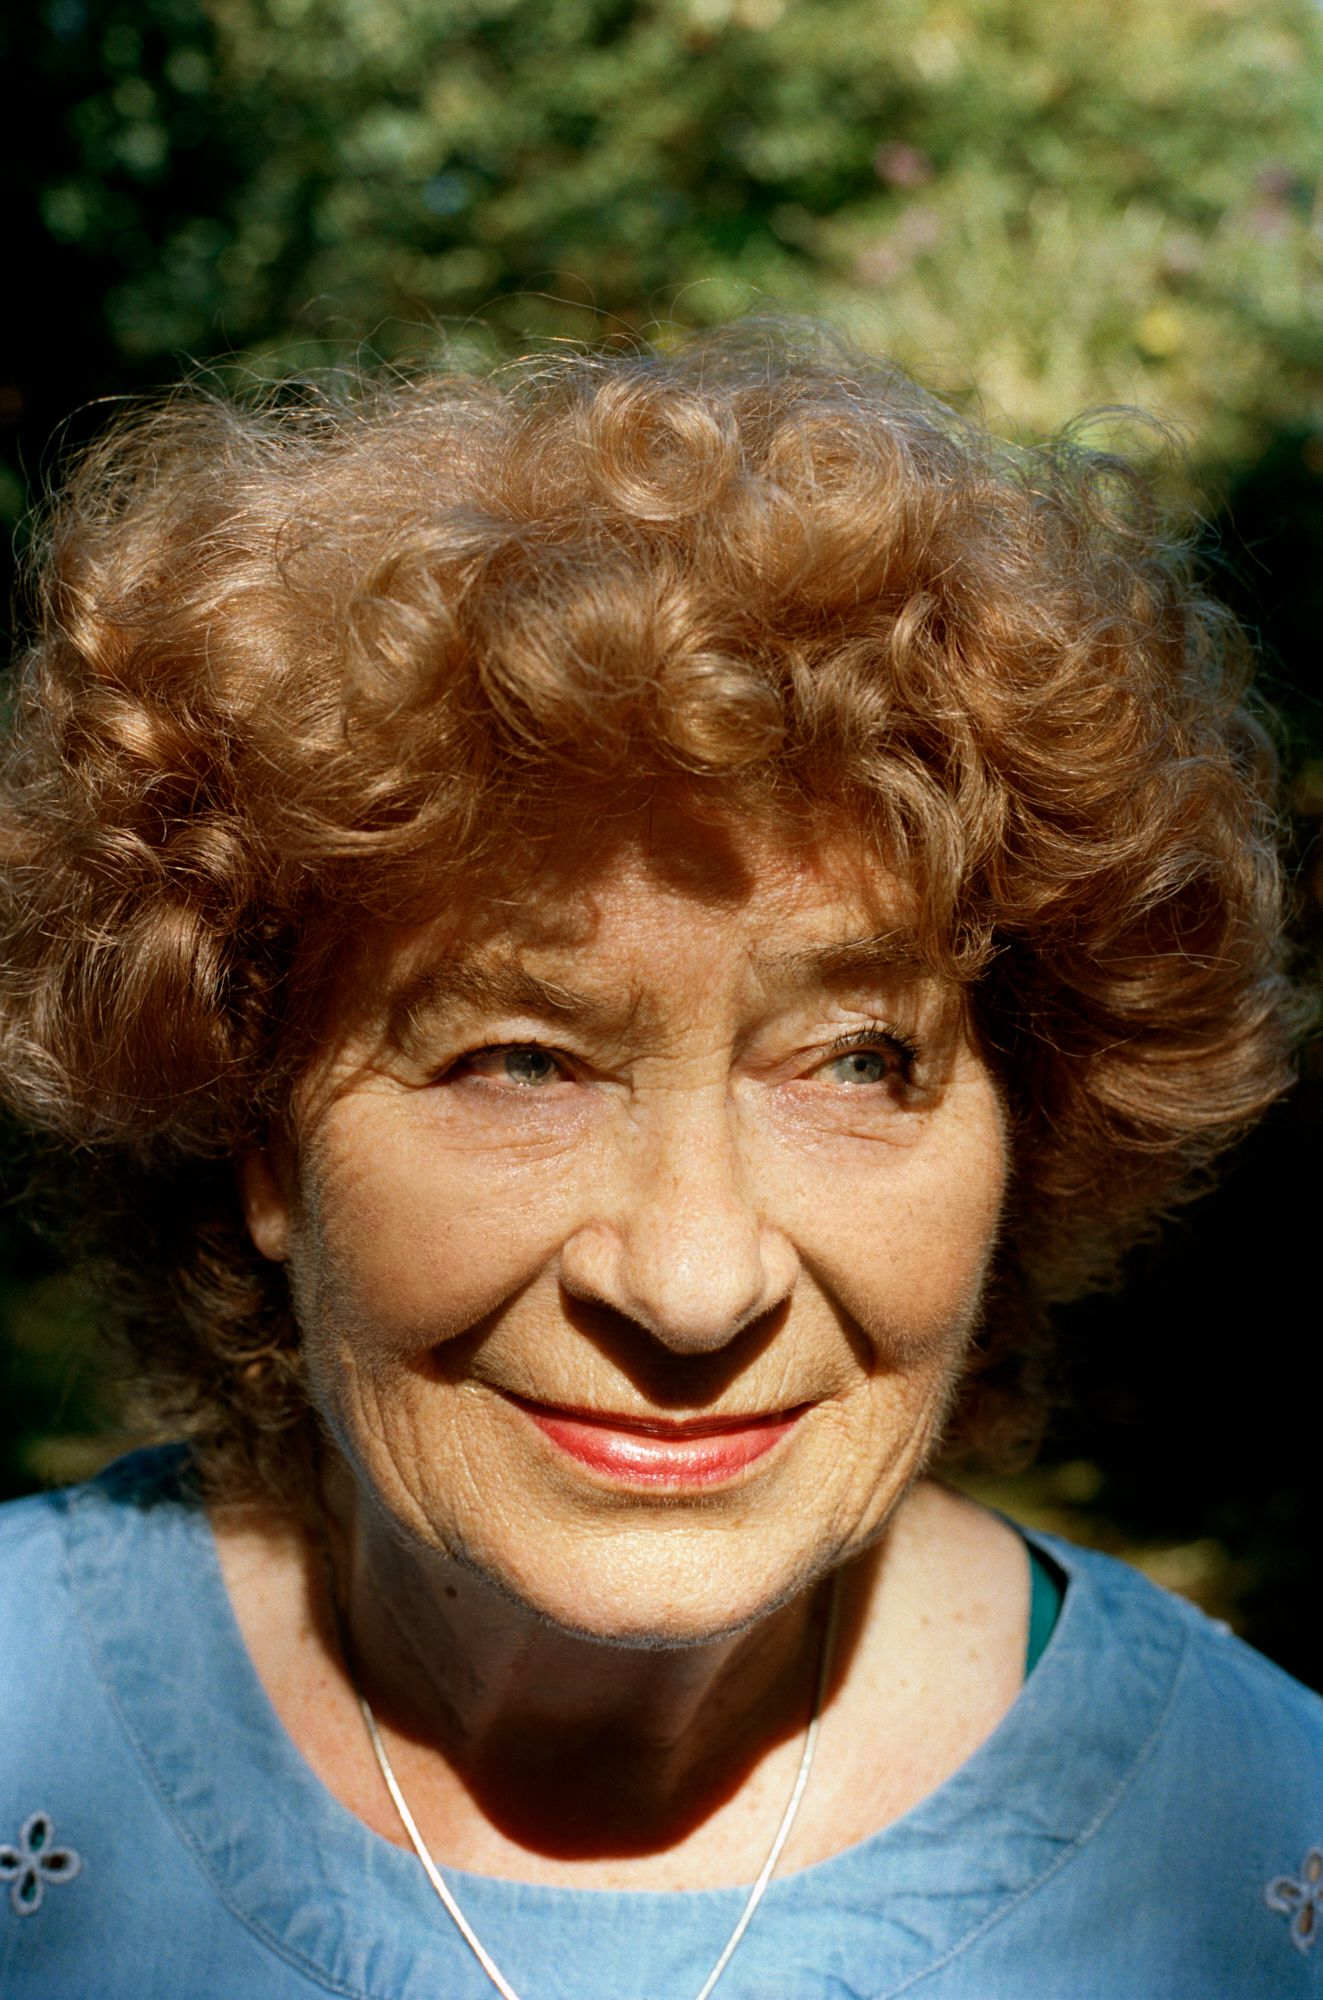 Tara Darby